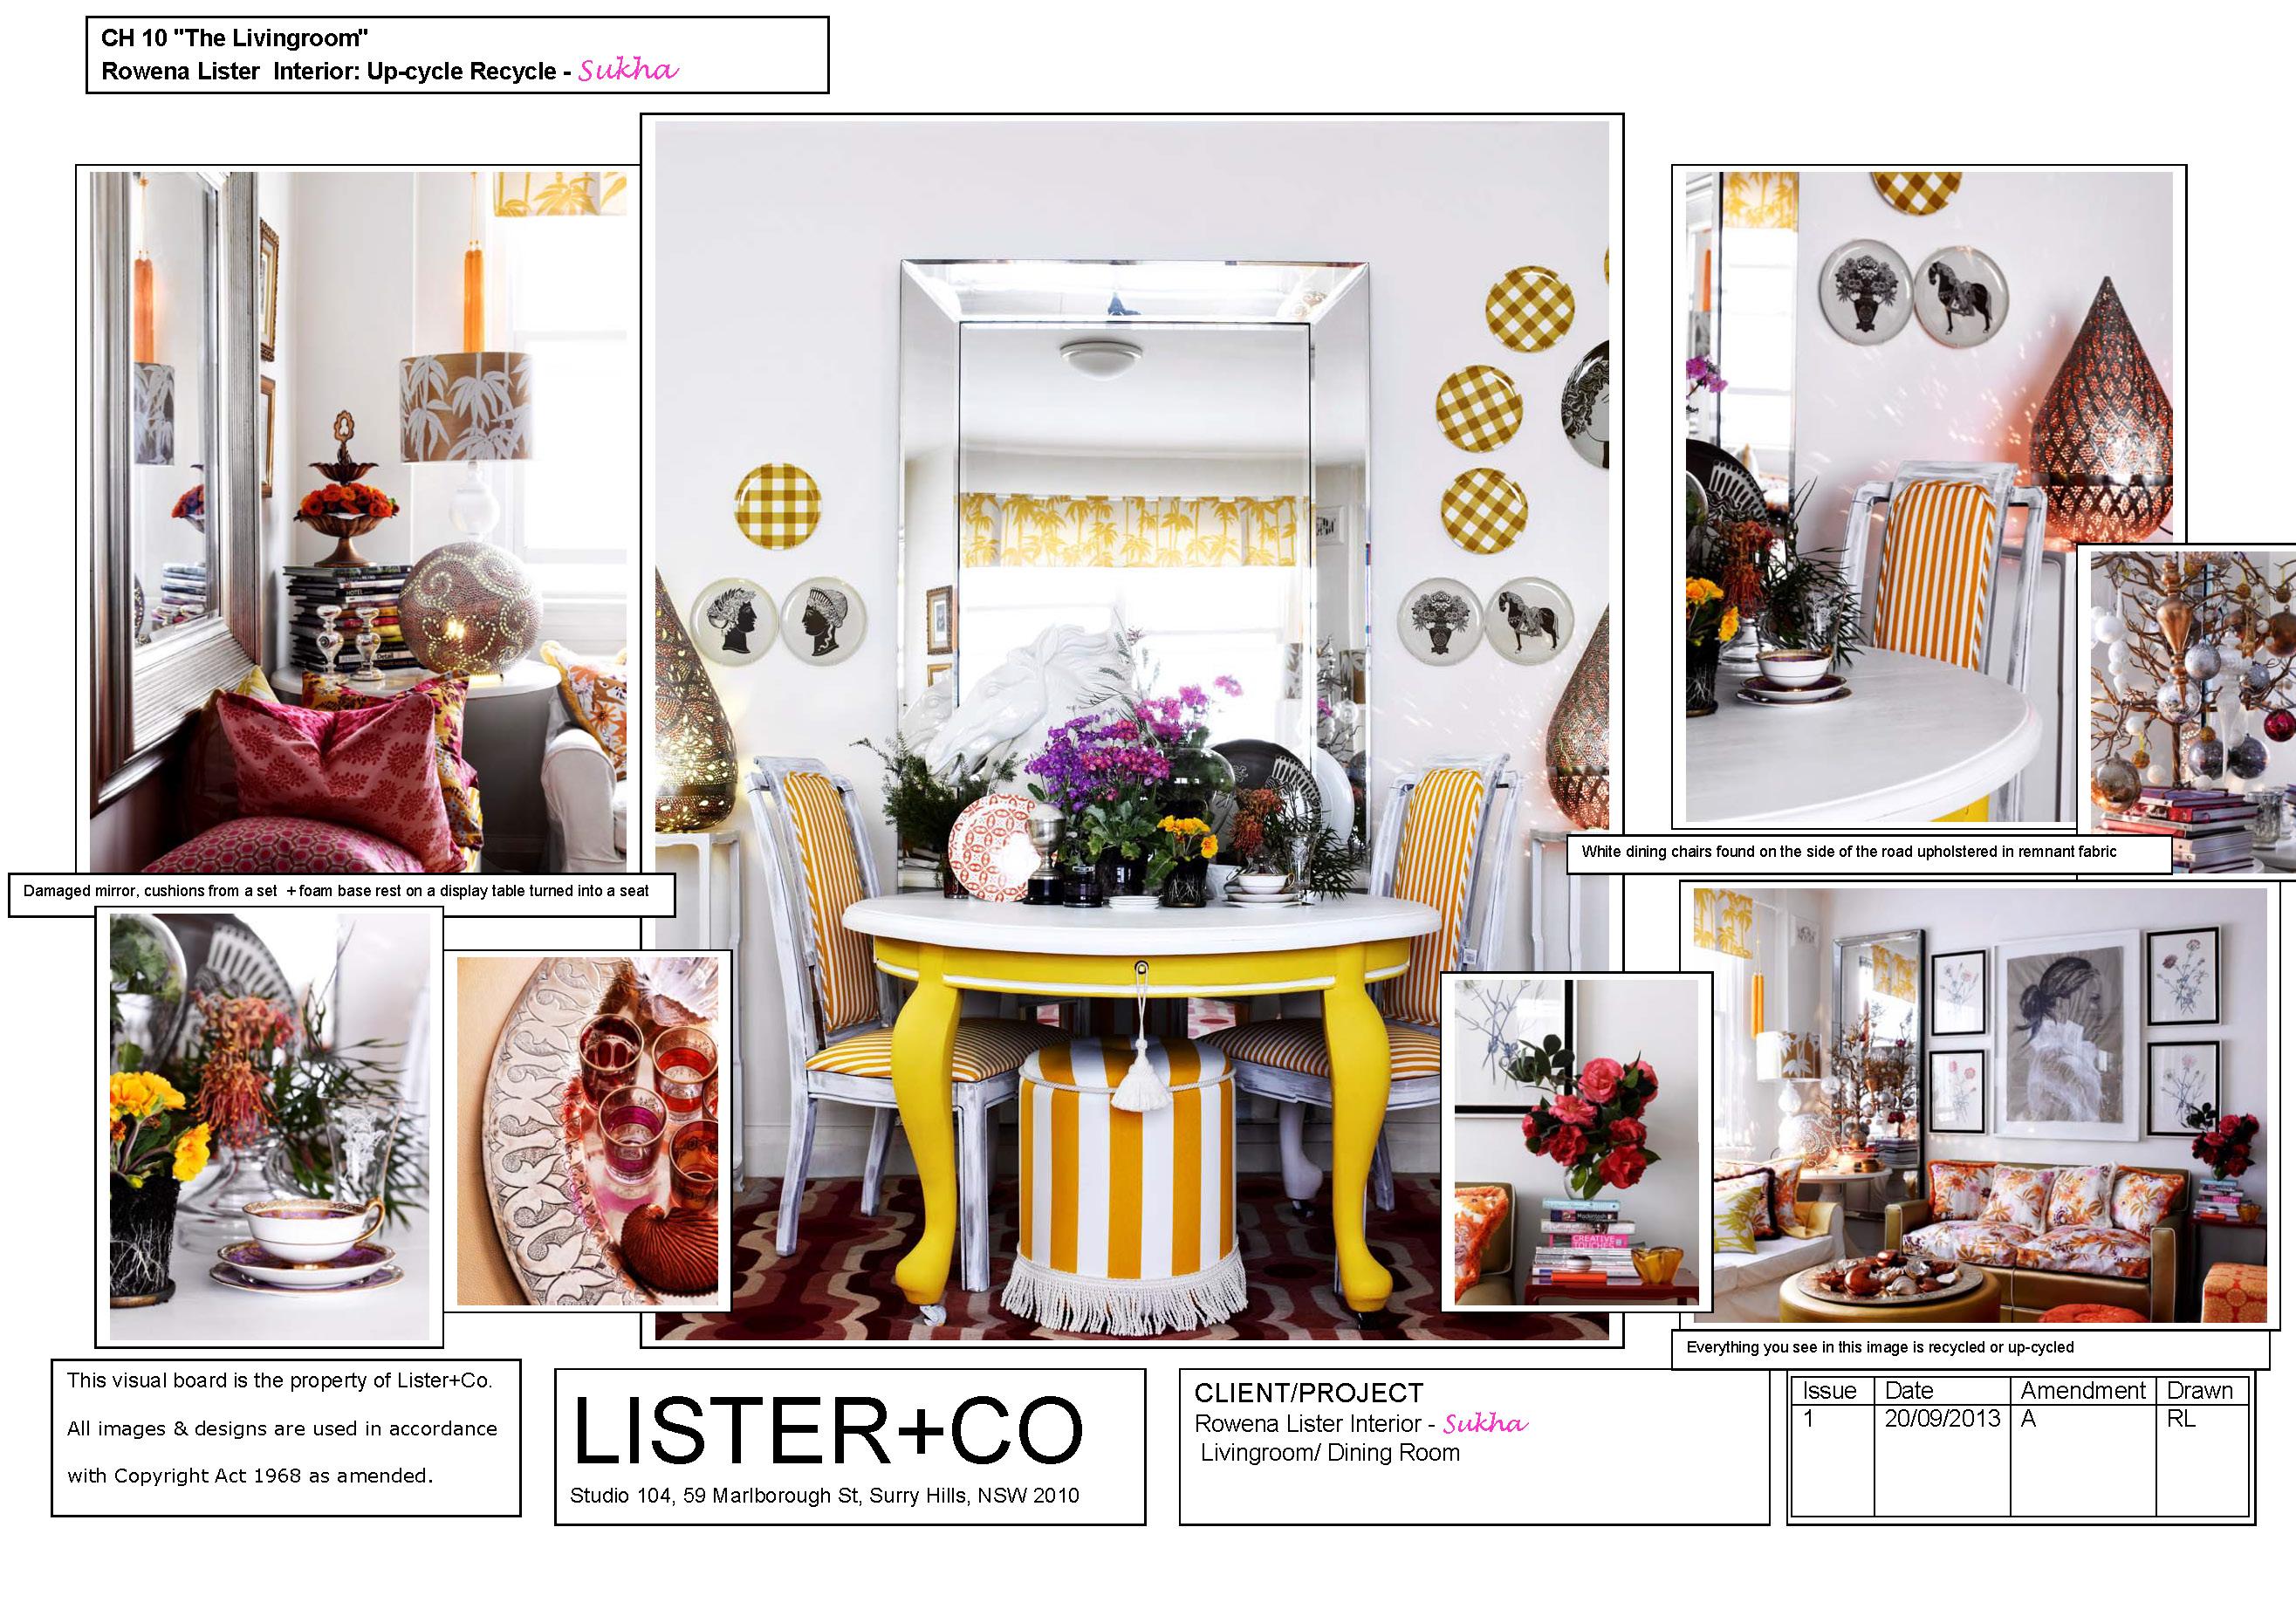 The Livingroom Dining Room